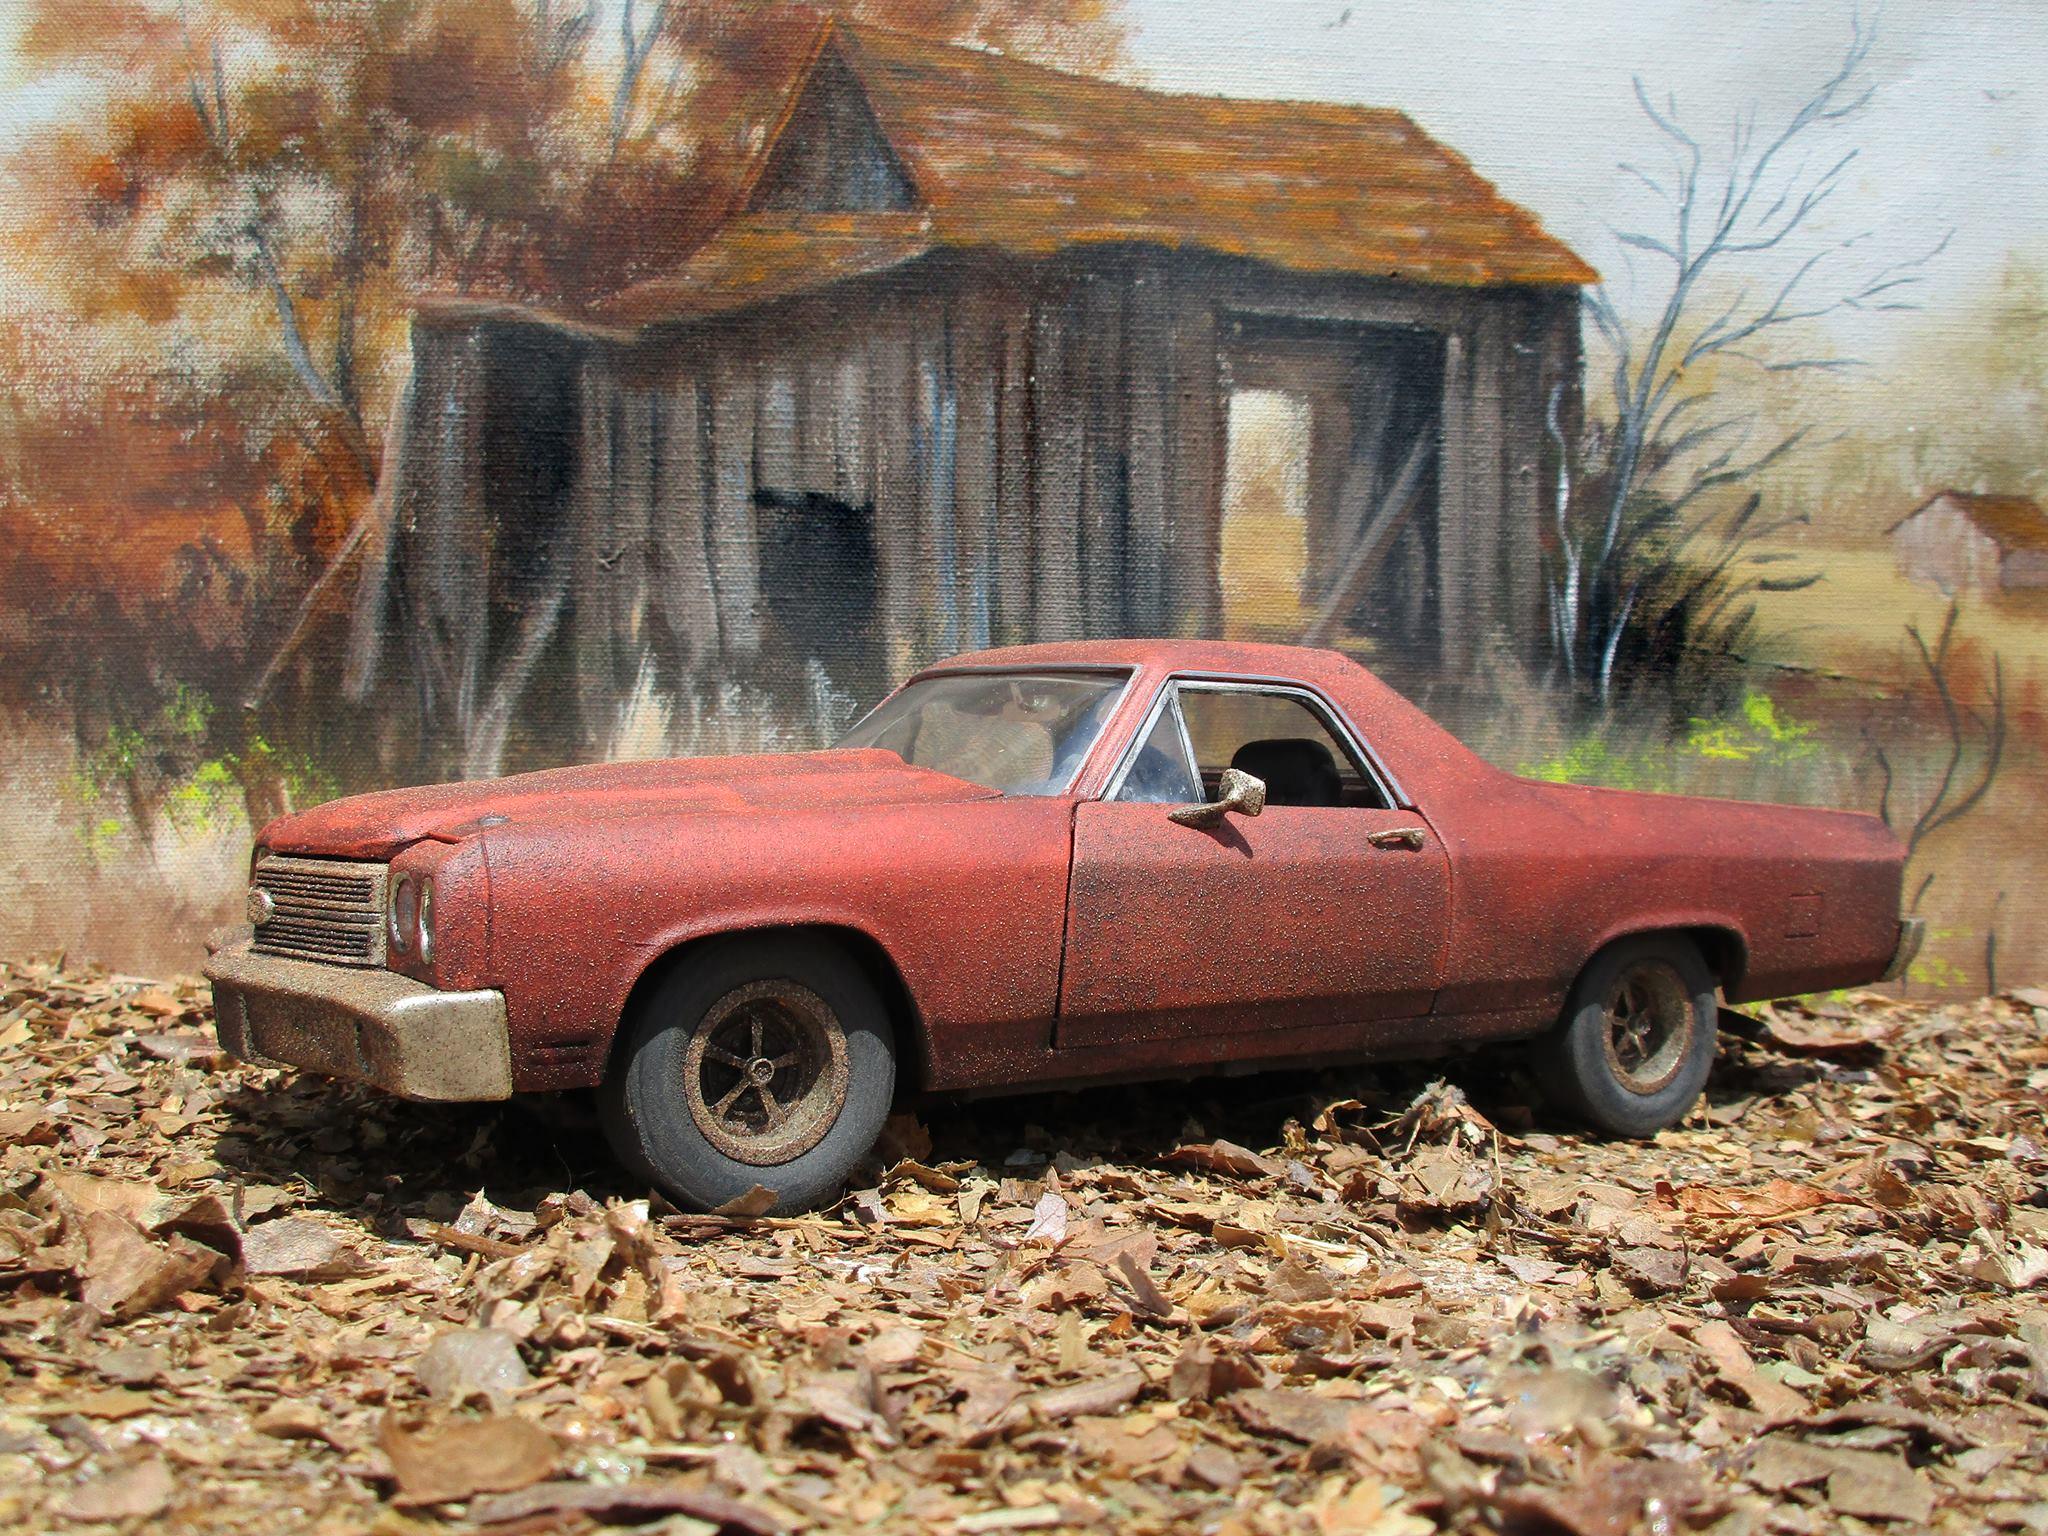 Chevy-elcamino-1971-1